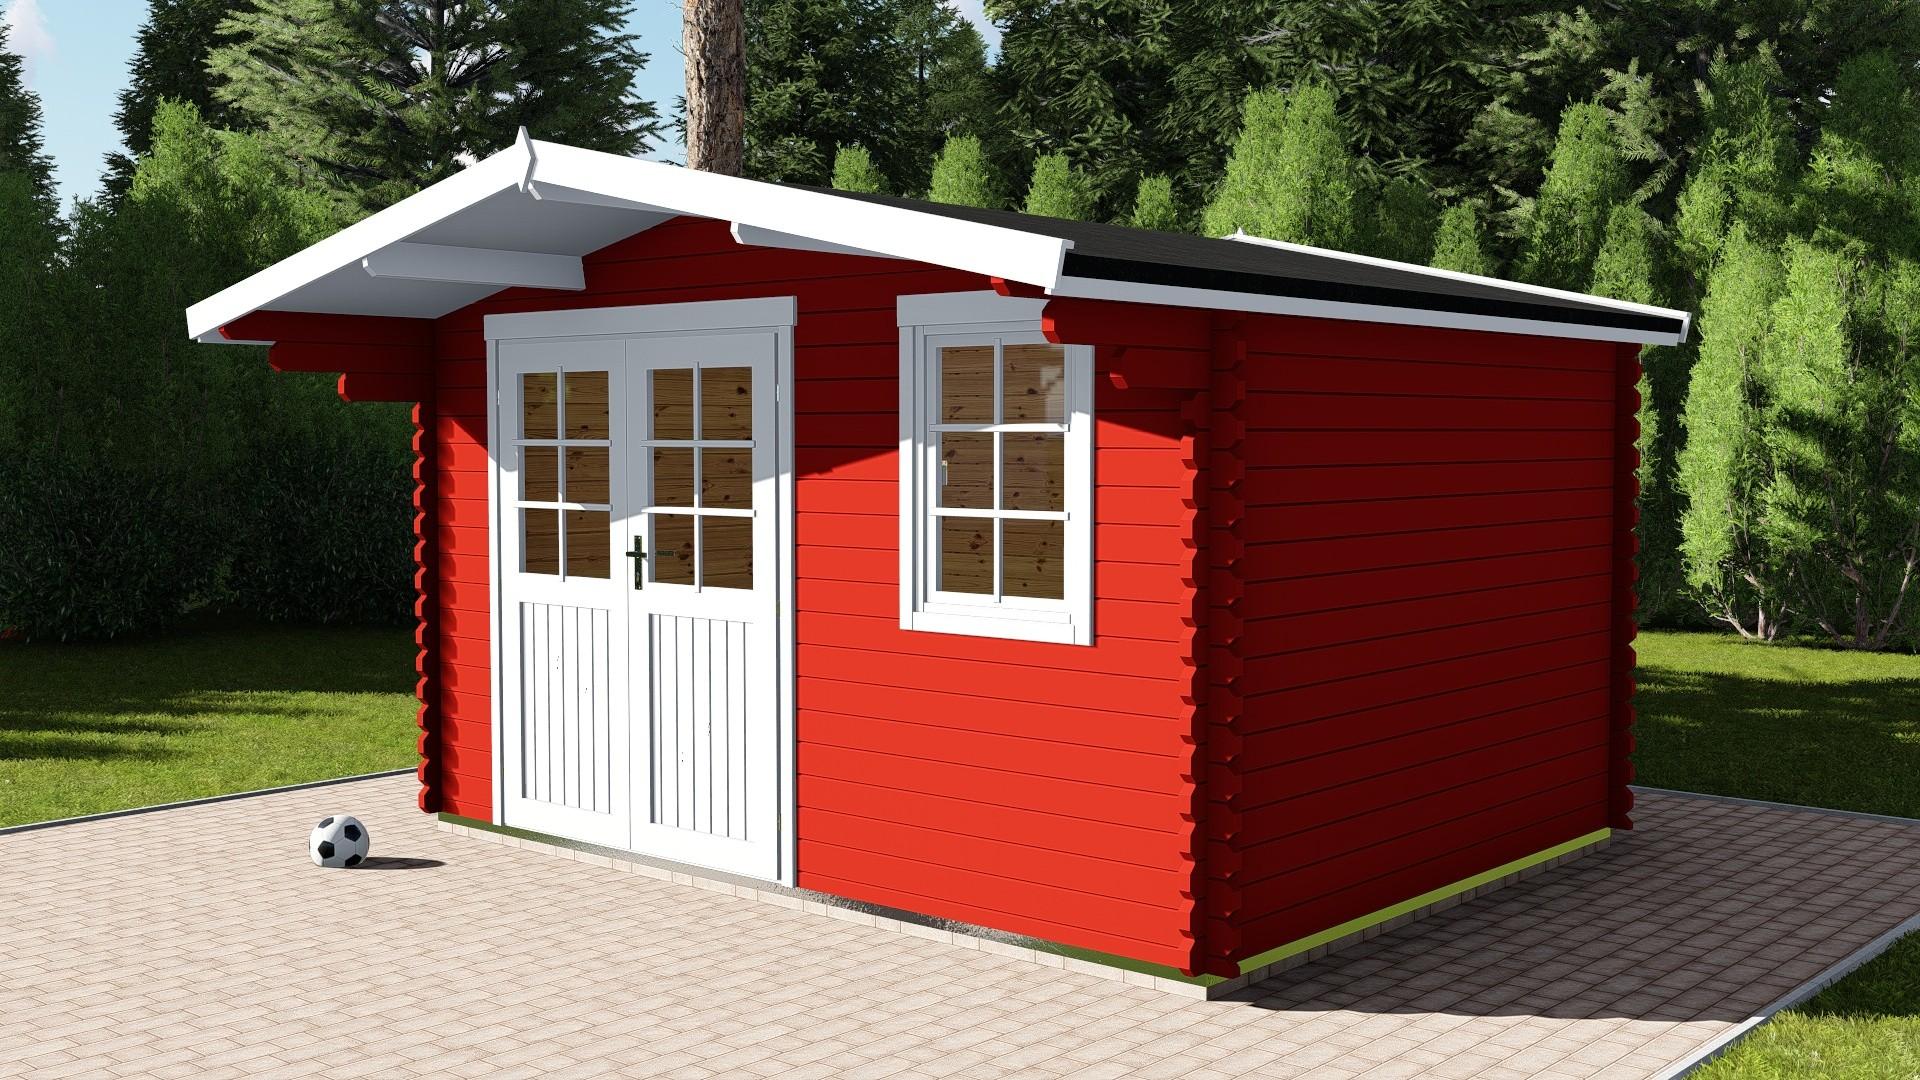 Gartenhaus 40 mm NWH Essen 40017